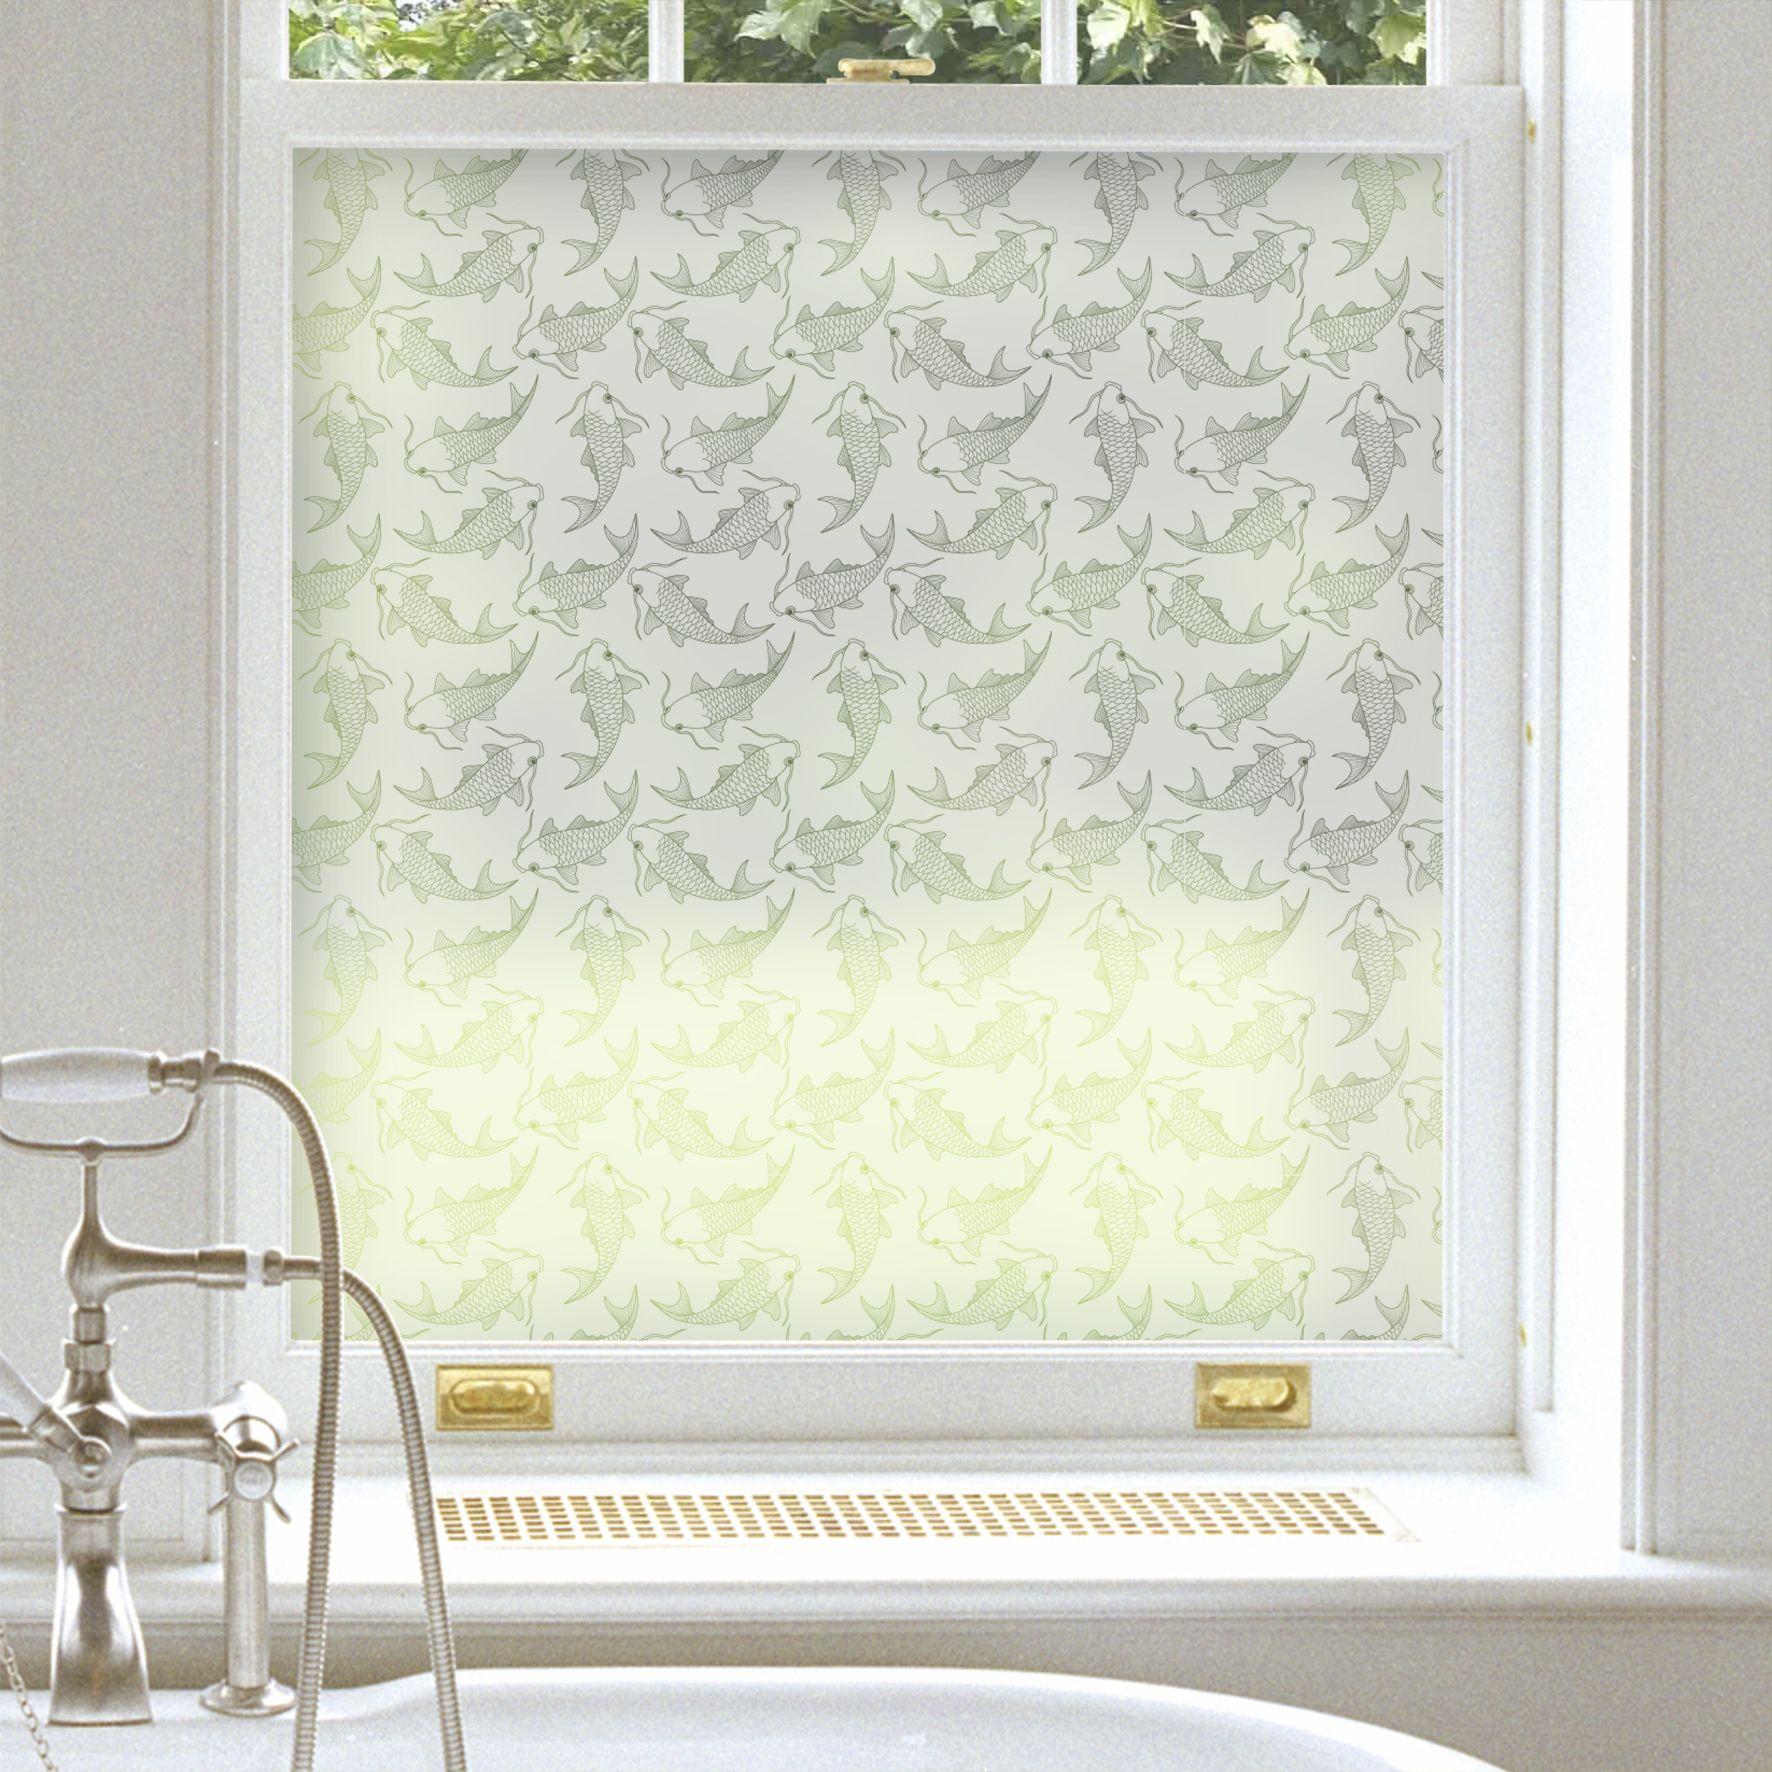 Permalink to 33 lovely stock of Bathroom Window Film